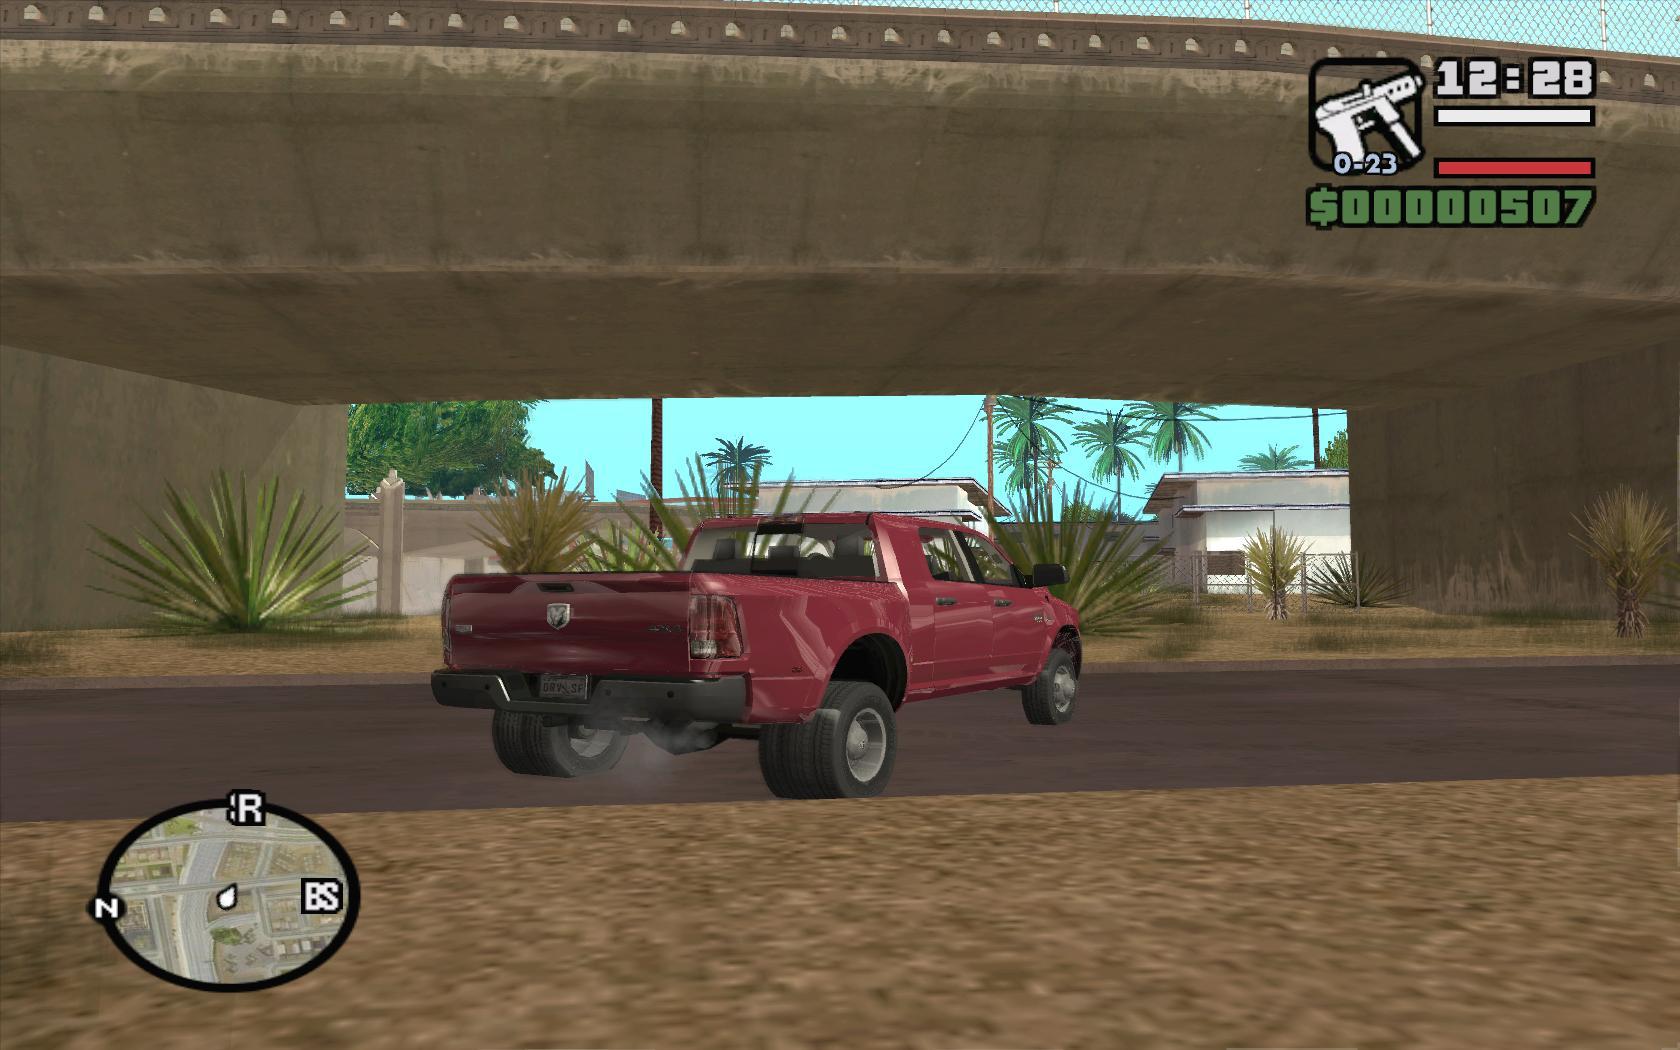 gta_sa 2012-07-23 17-14-01-68.jpg - Grand Theft Auto: San Andreas